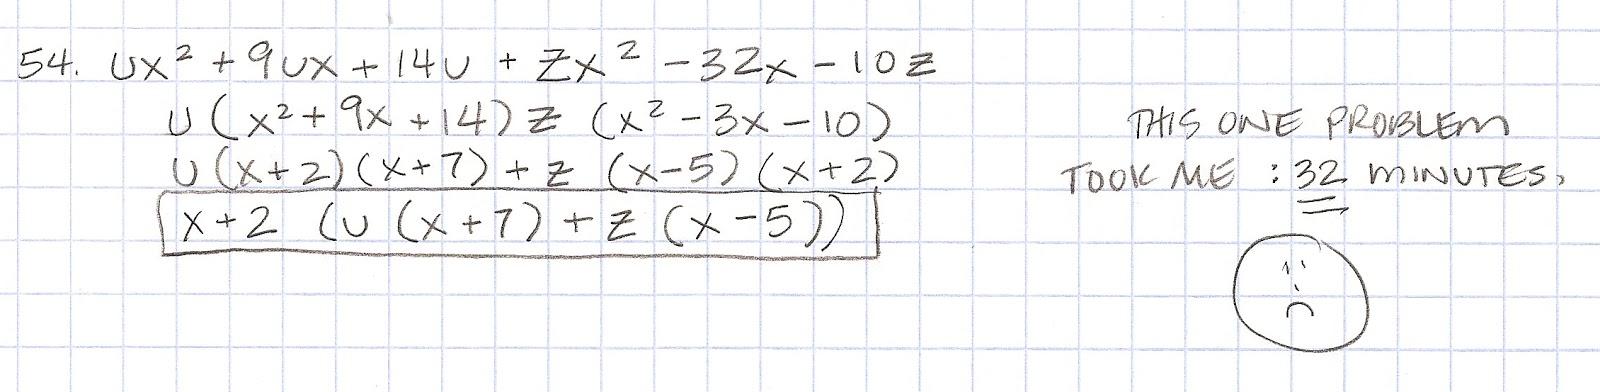 one page essay steps to writing a history research paper political do my math problems algebra homework help online algebra crash course algebra problem solver